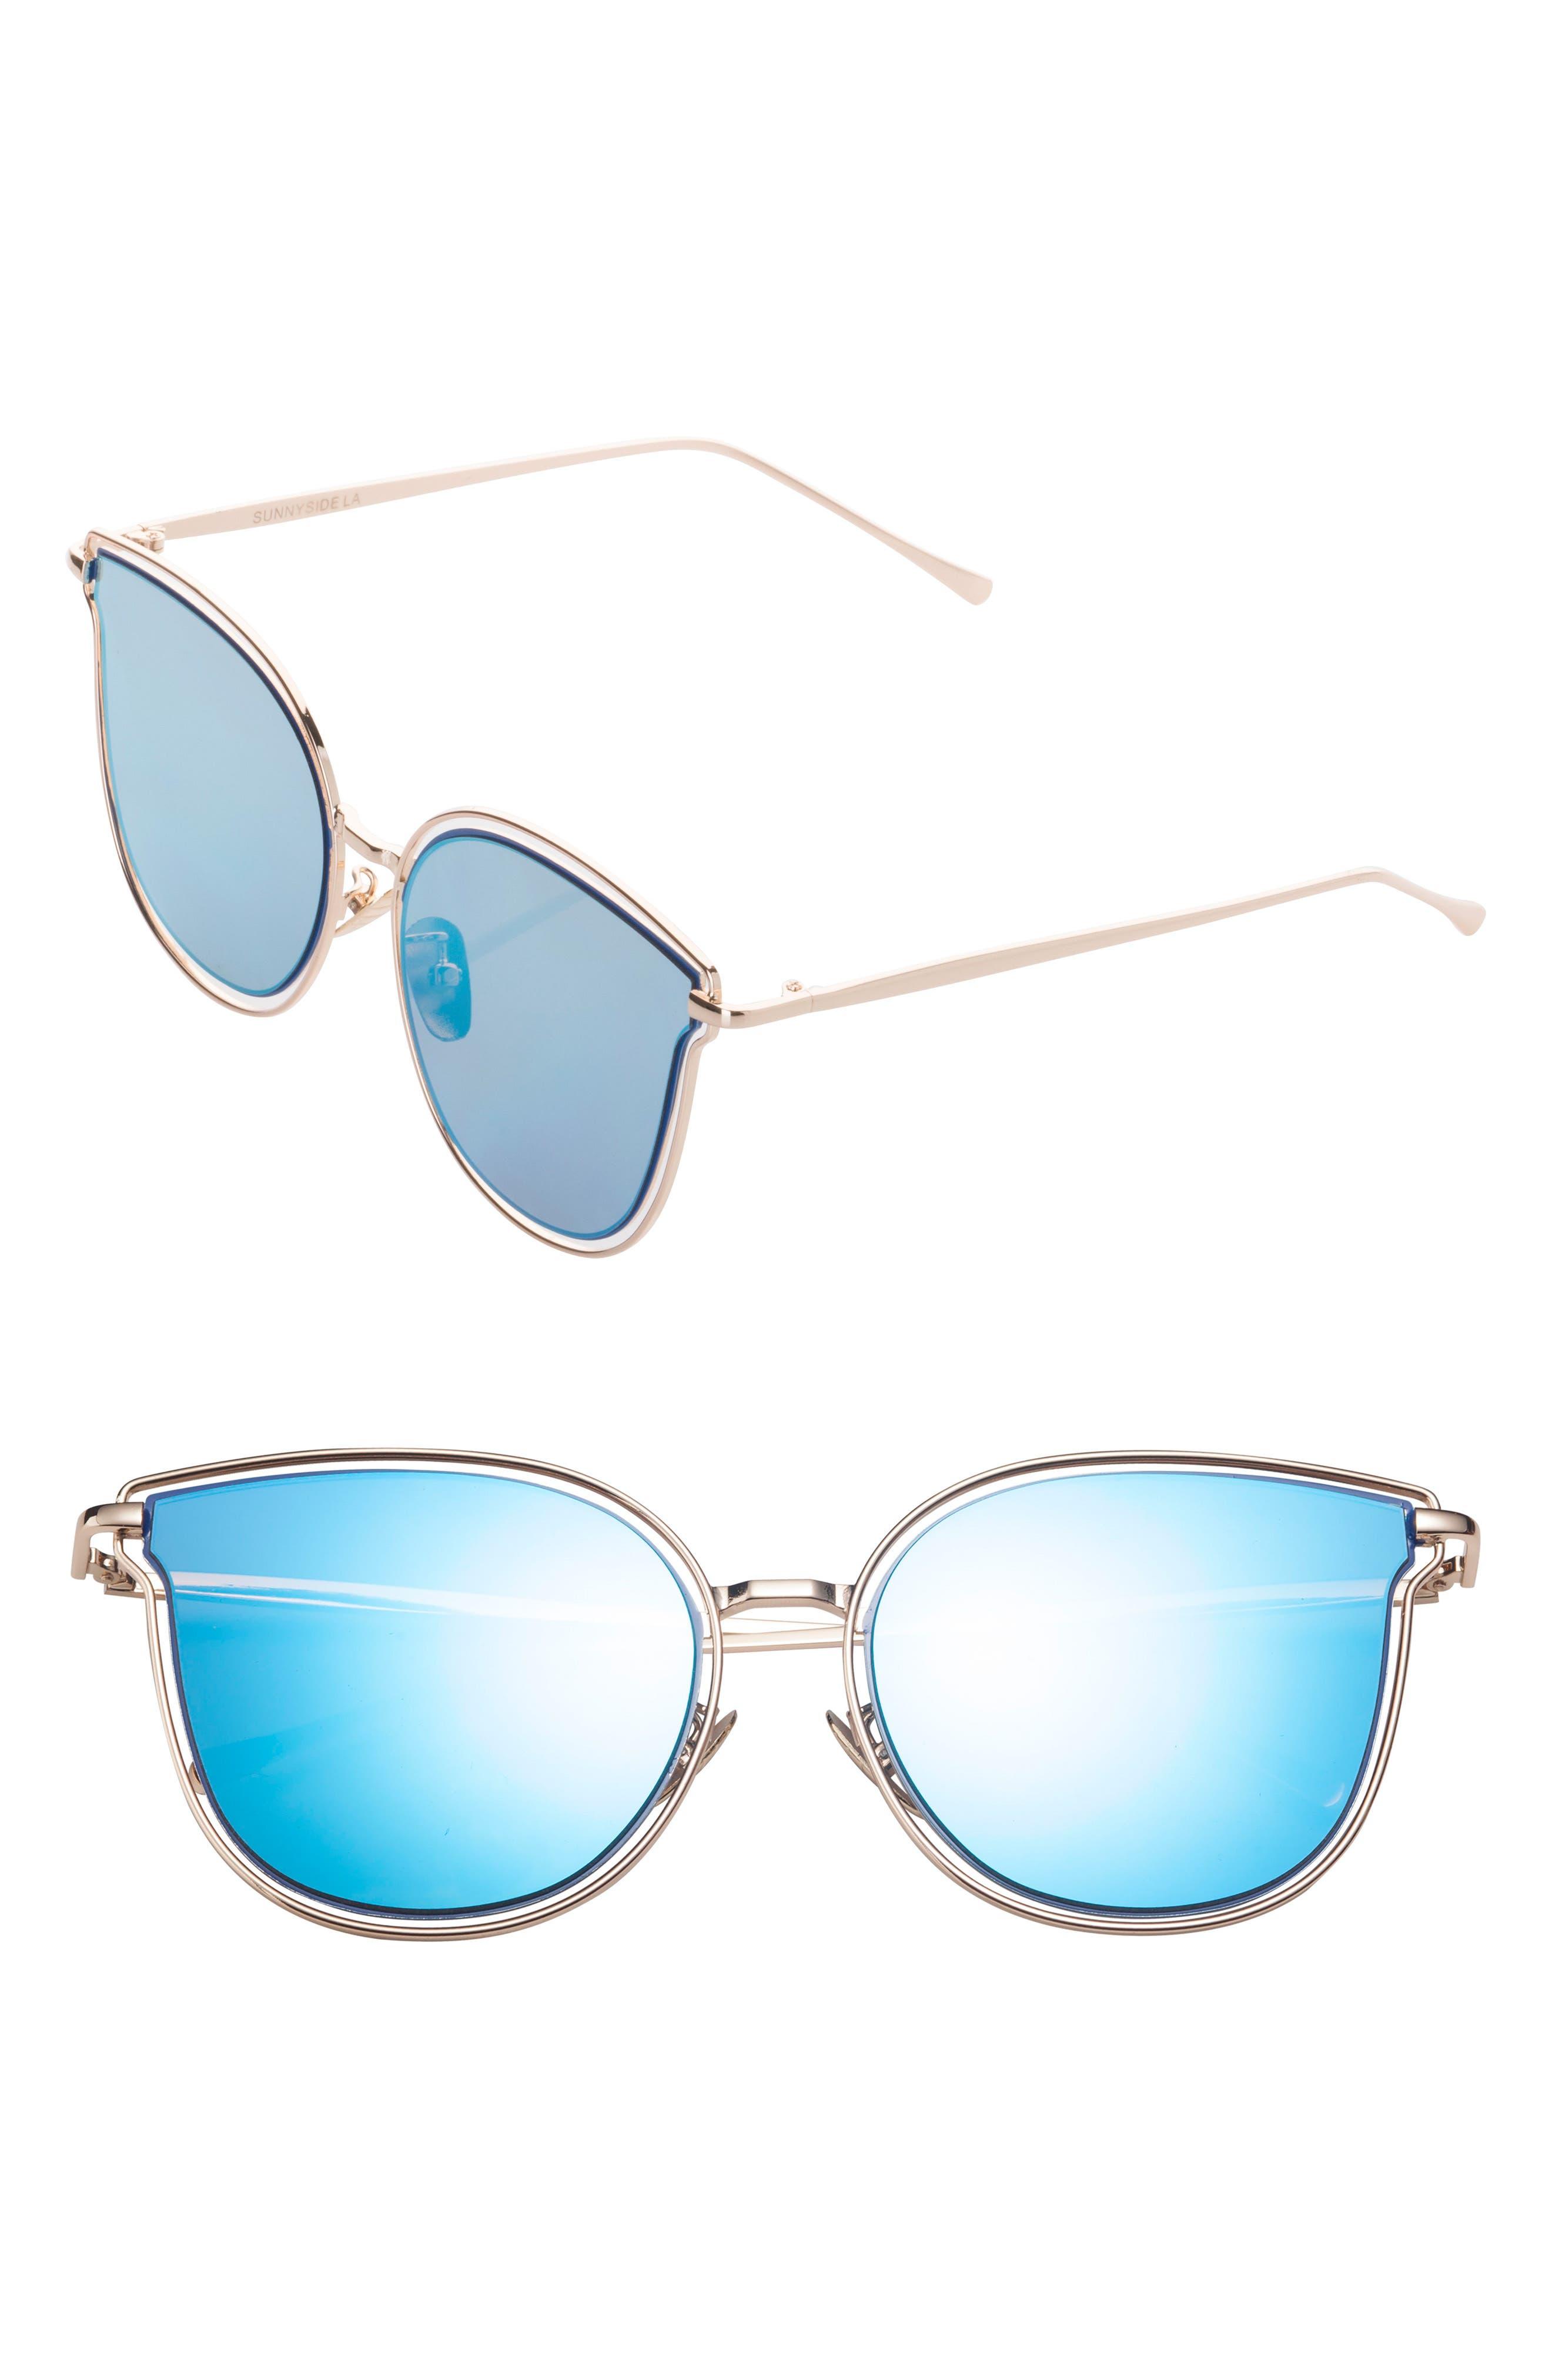 Sunnyside LA 54mm Sunglasses